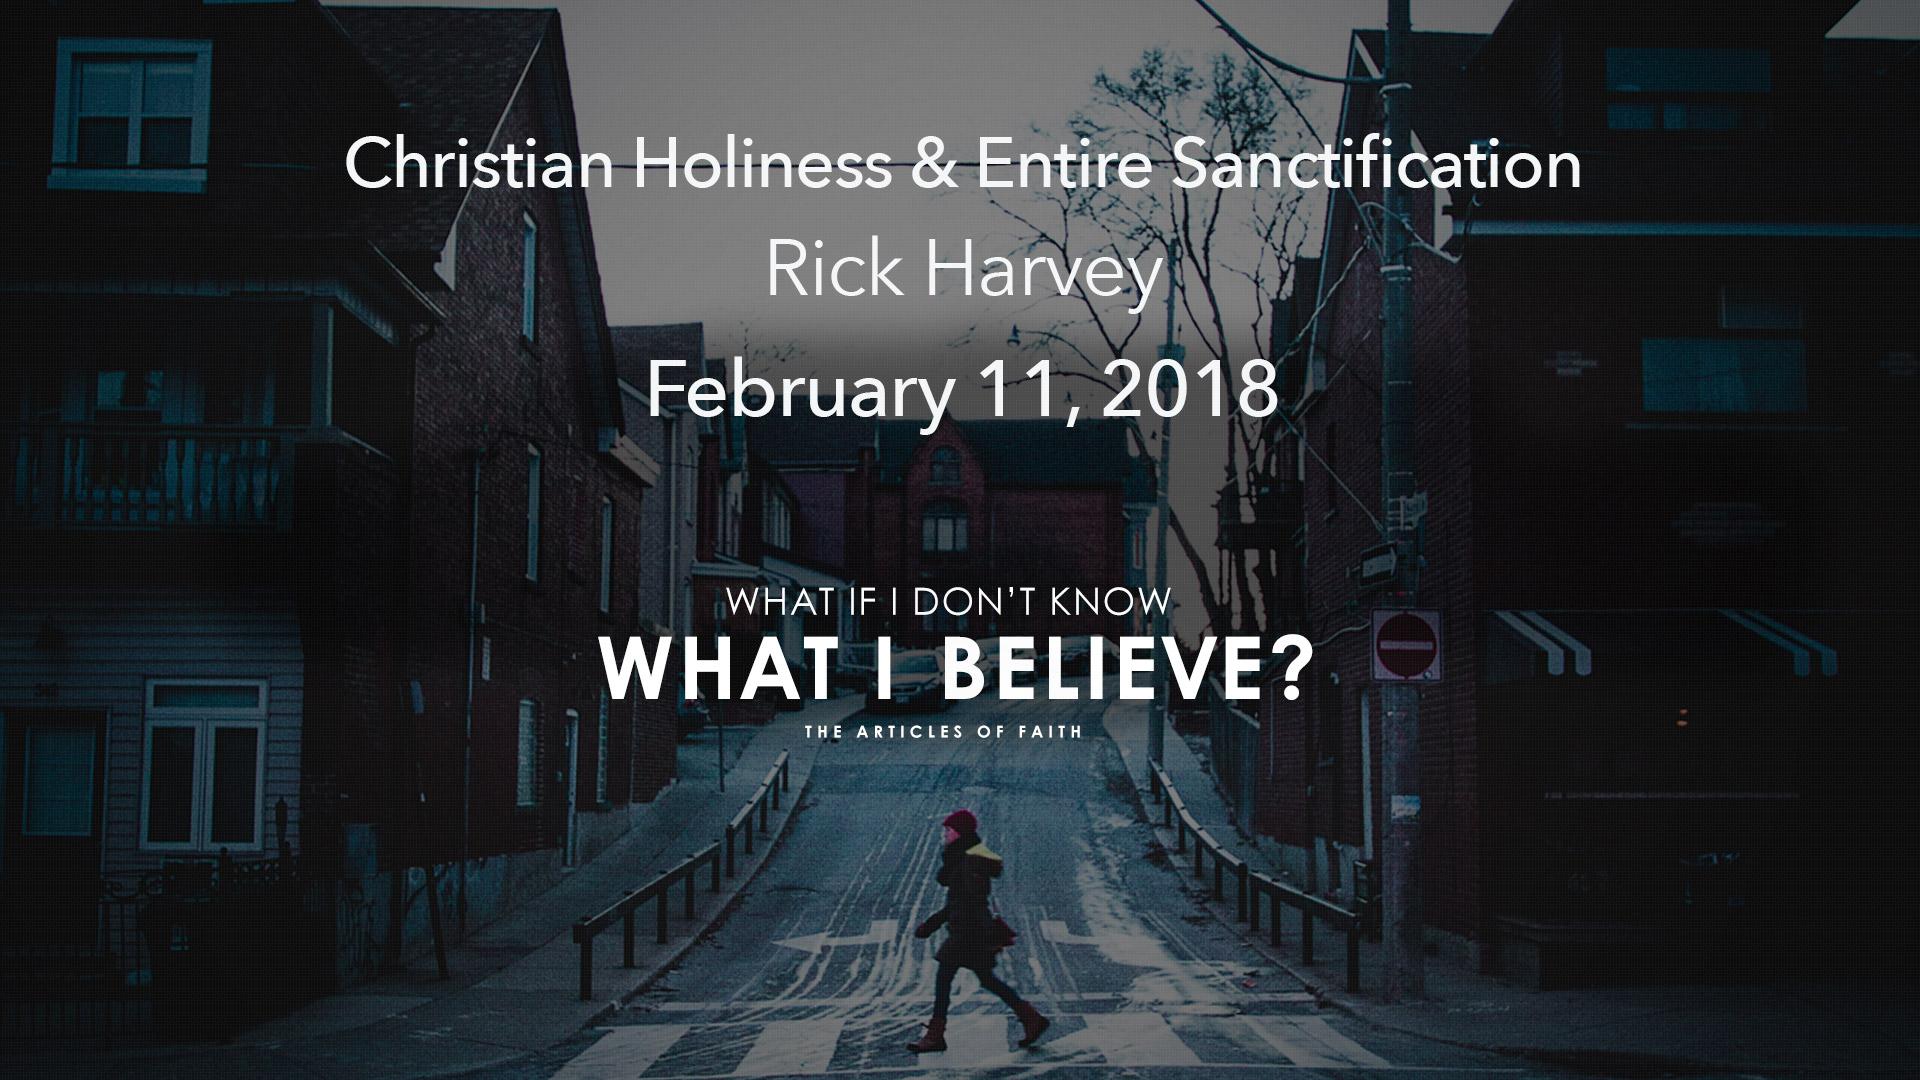 Believe2018_Vimeo_Feb11.jpg